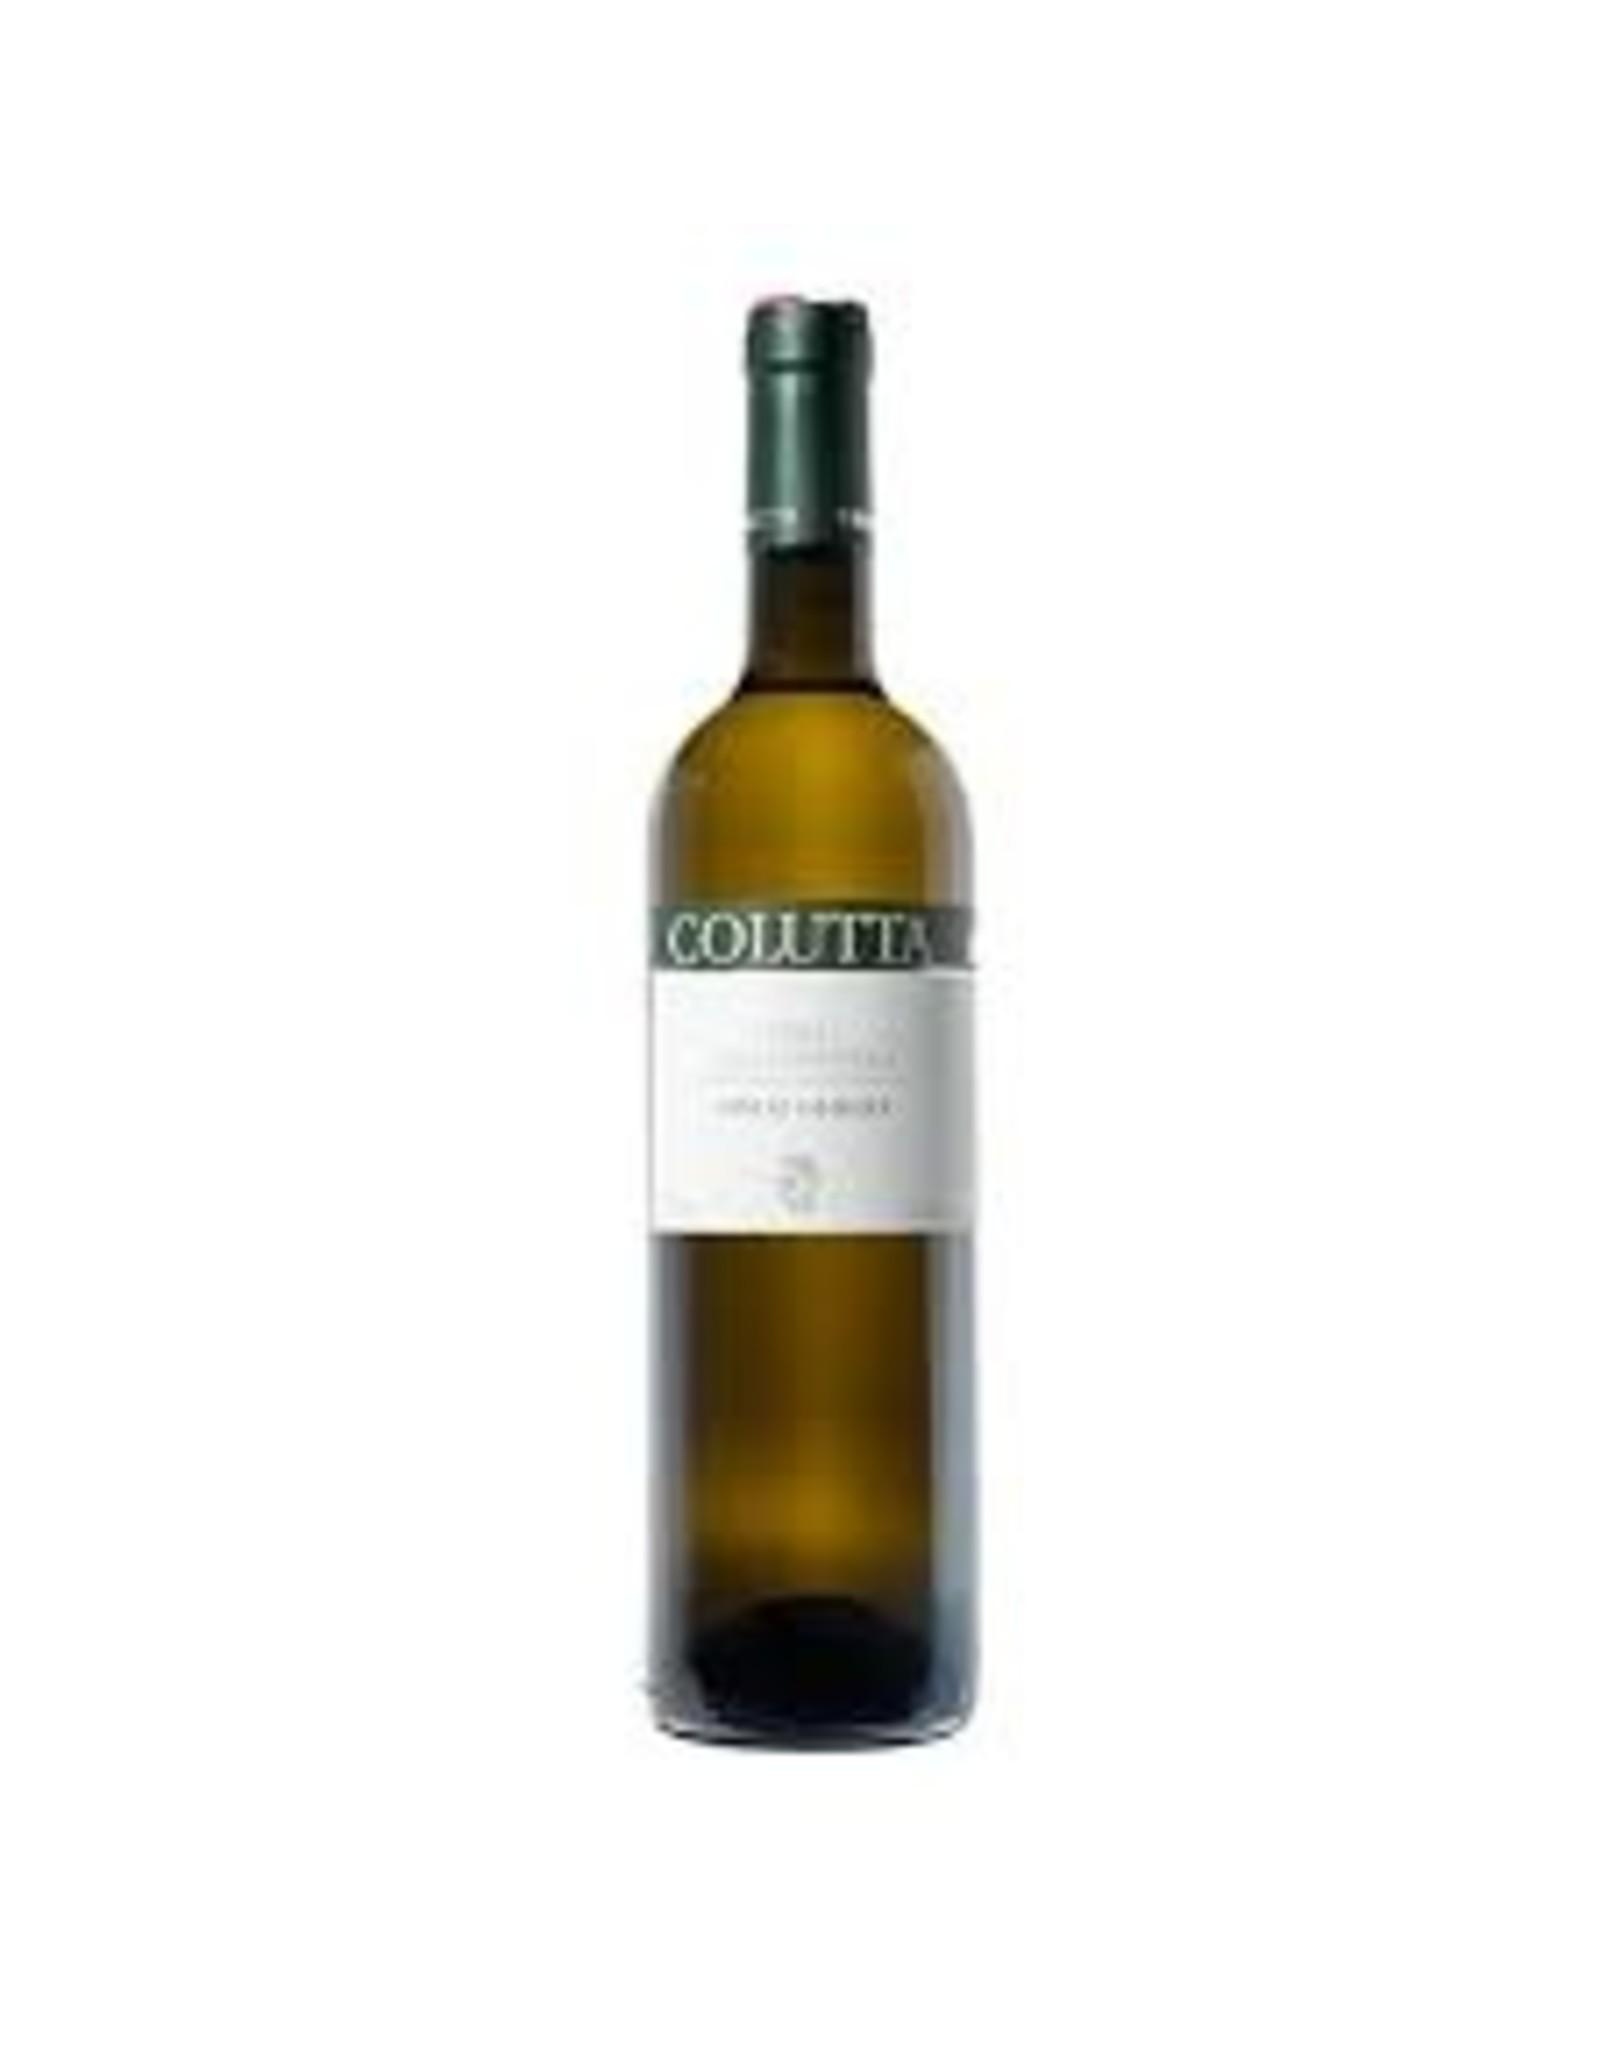 Colutta Pinot Grigio